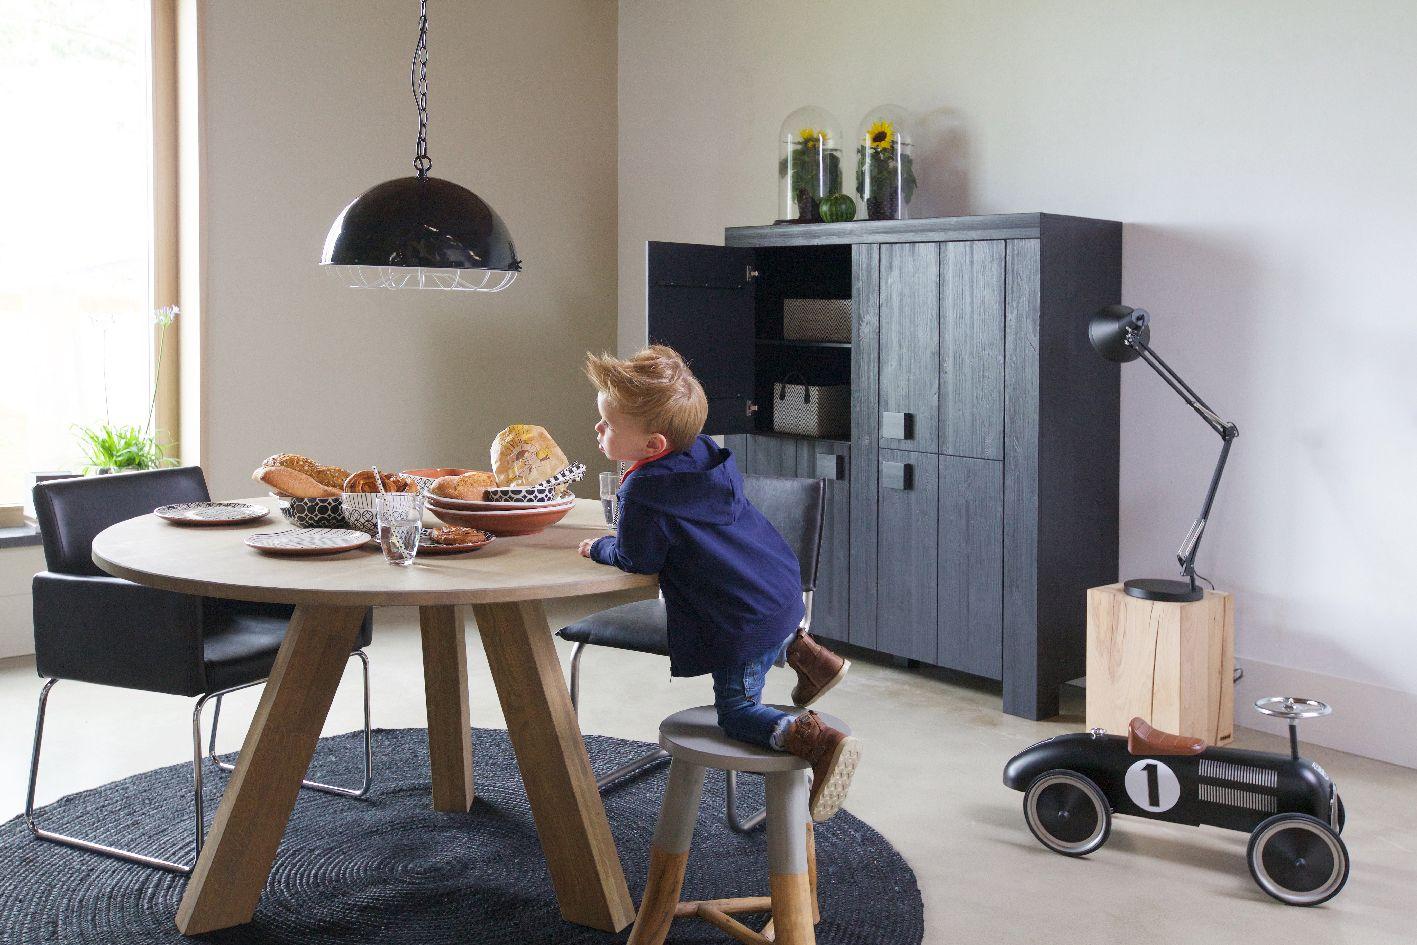 Woood Ronde Tafel : Eettafel kwantum mndw huisjeaandehaven eettafel rhonda woood ronde